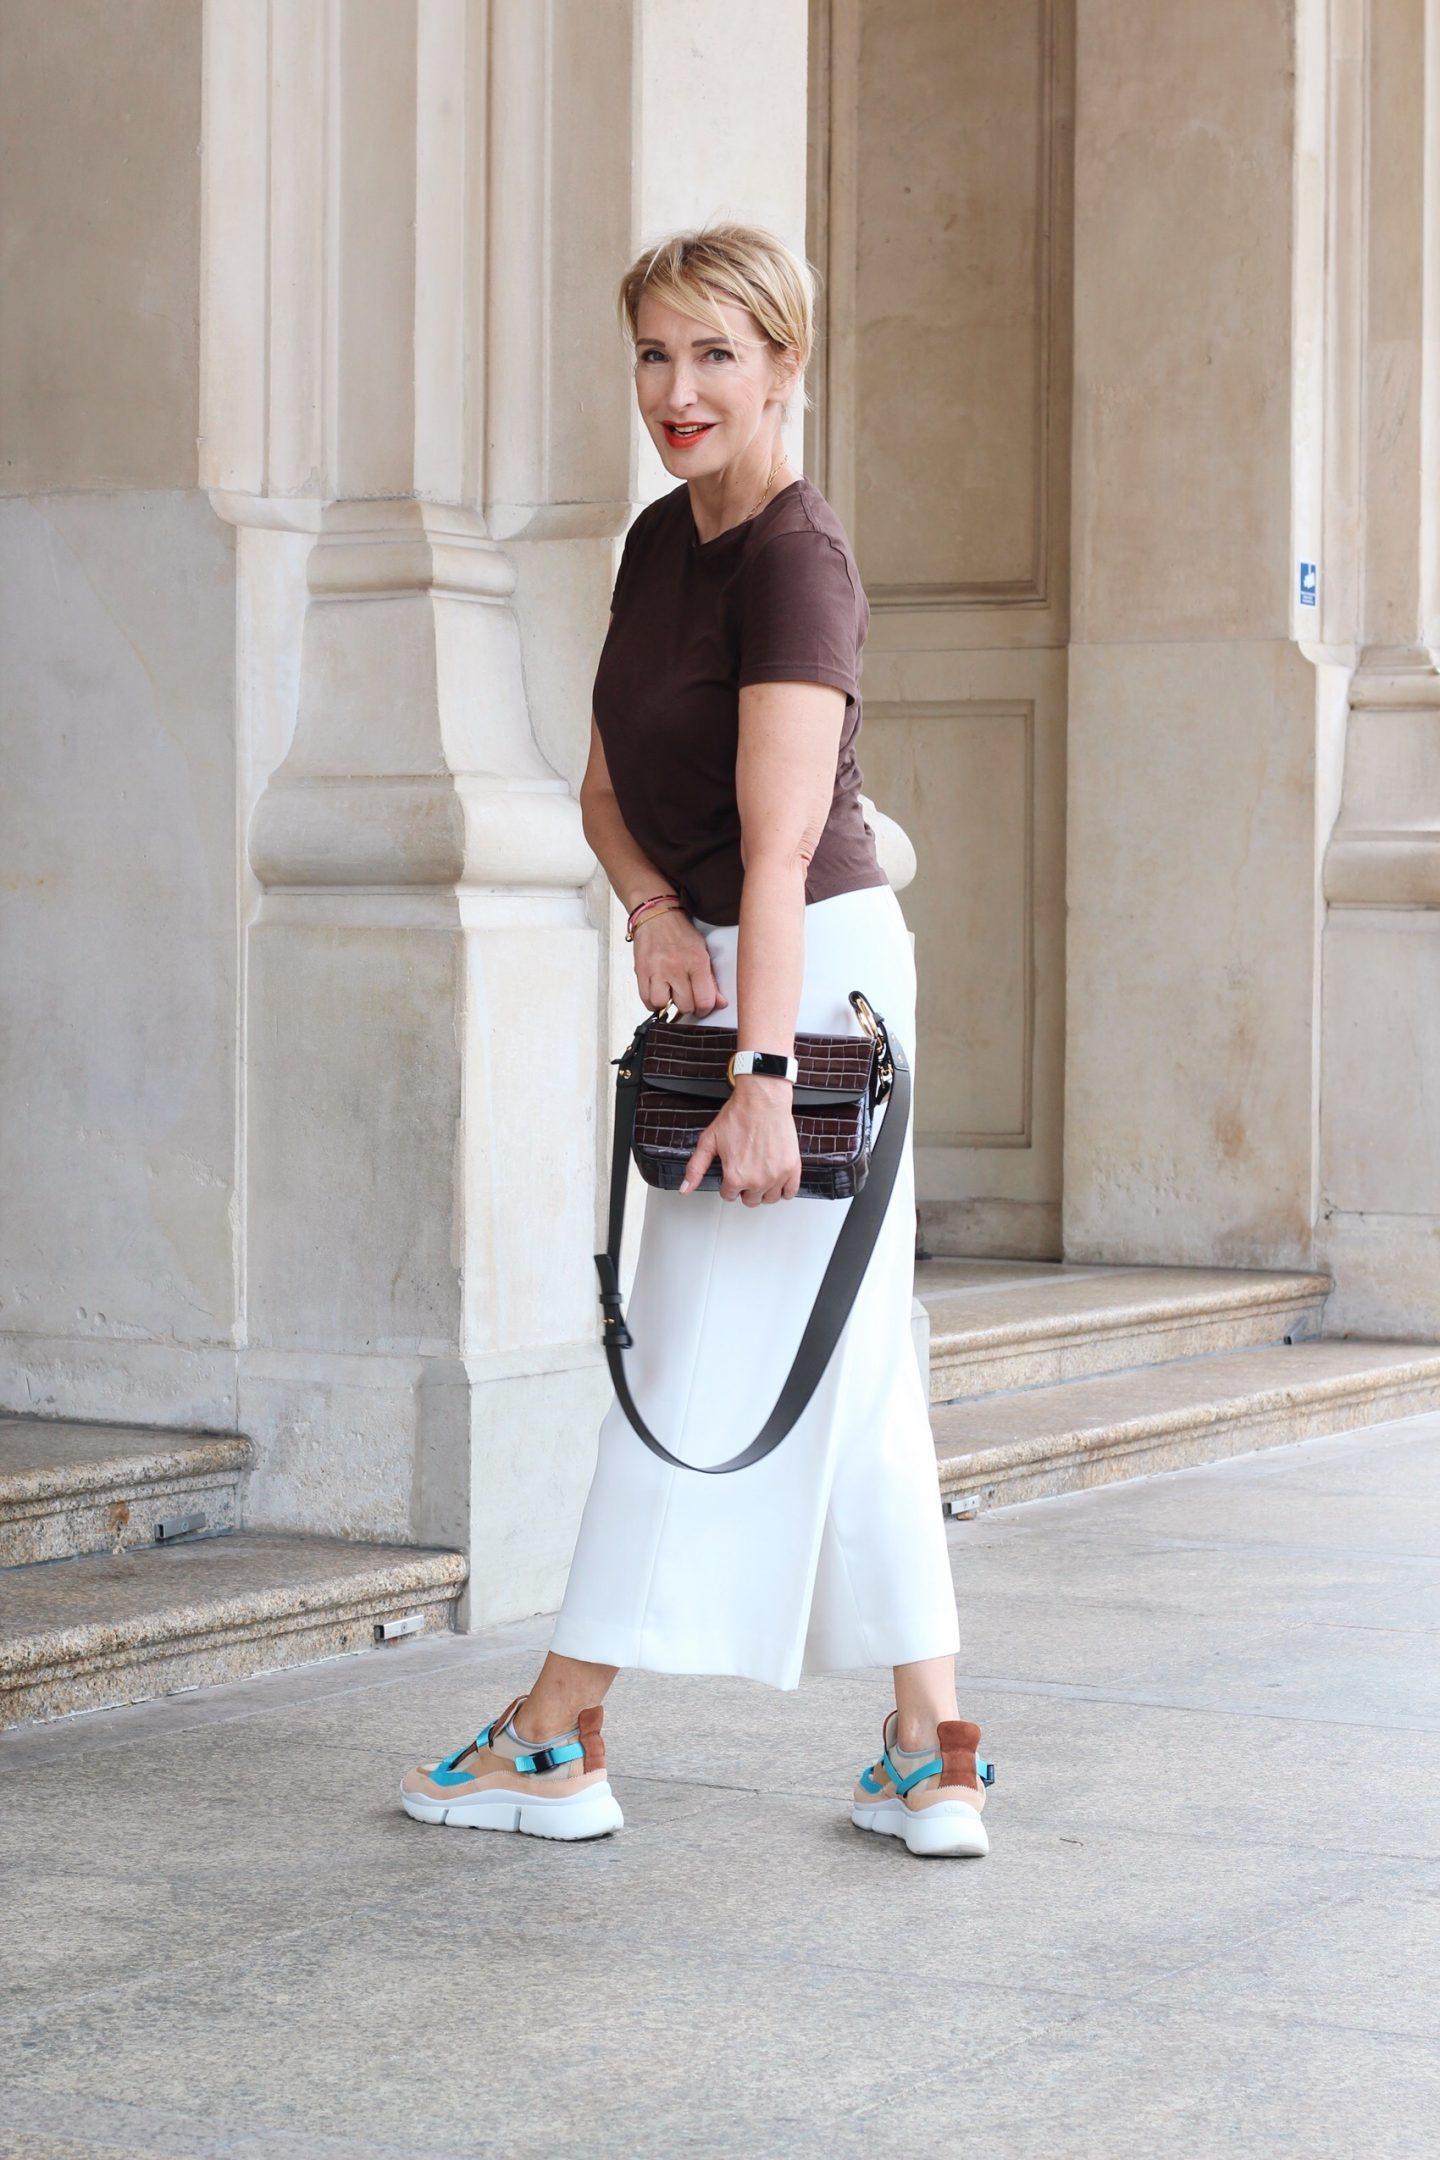 glamupyourlifestyle Chloe-Sneakers ugly-sneaker Culottes ü-40-blog ü-50-blog ü-50-mode